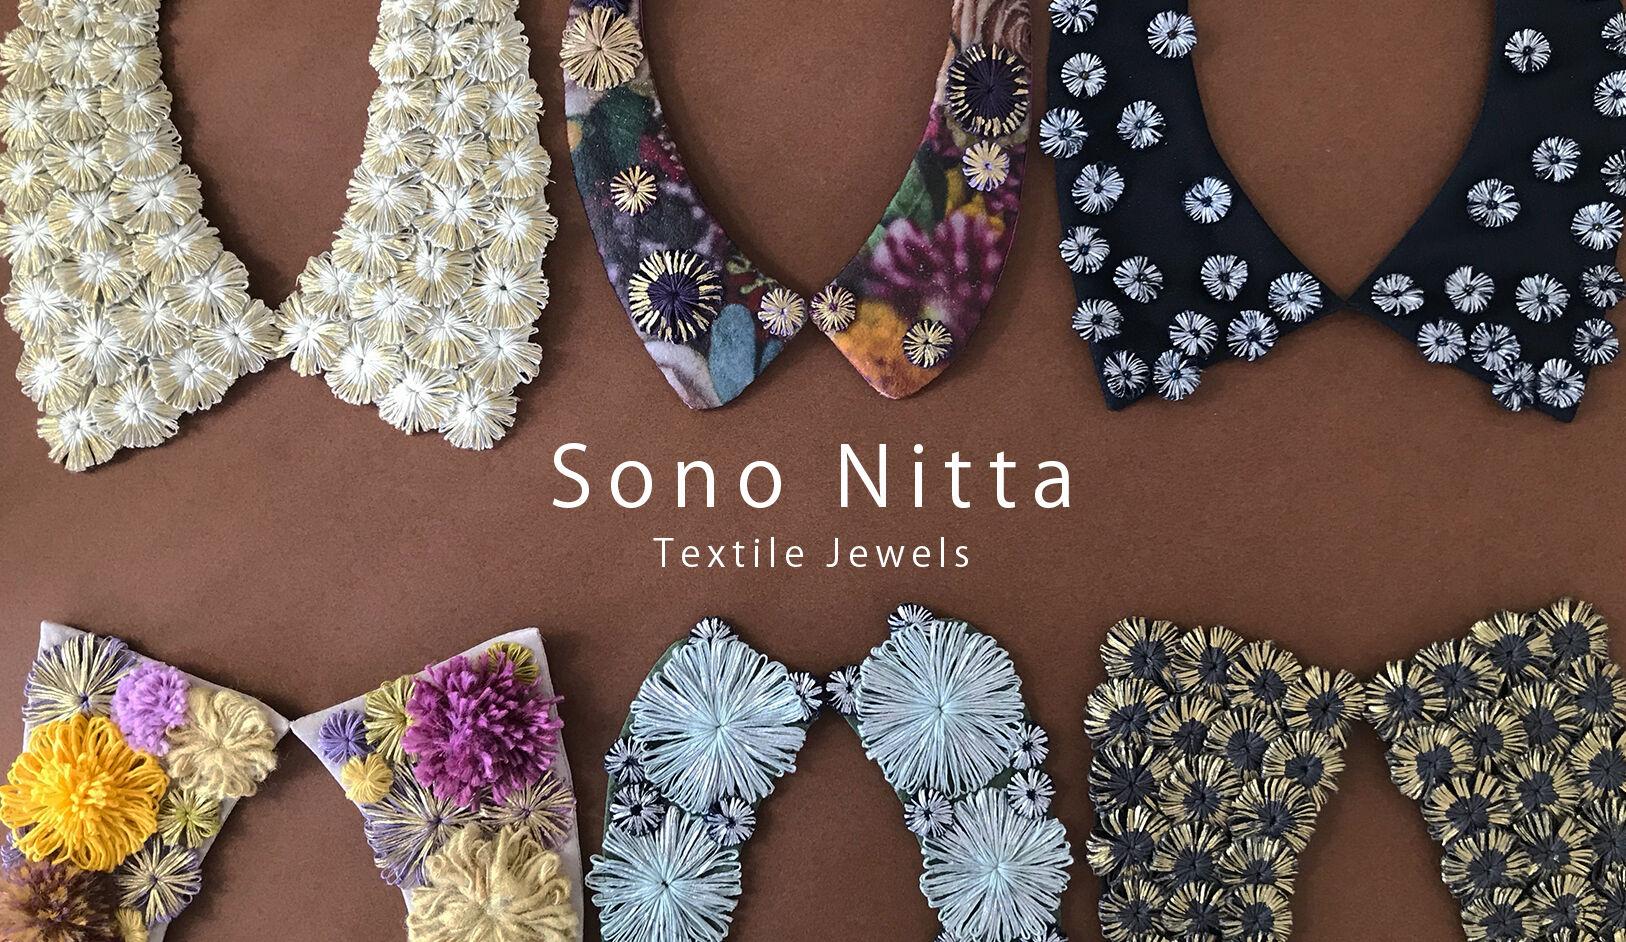 Sono Nitta Textile Jewels